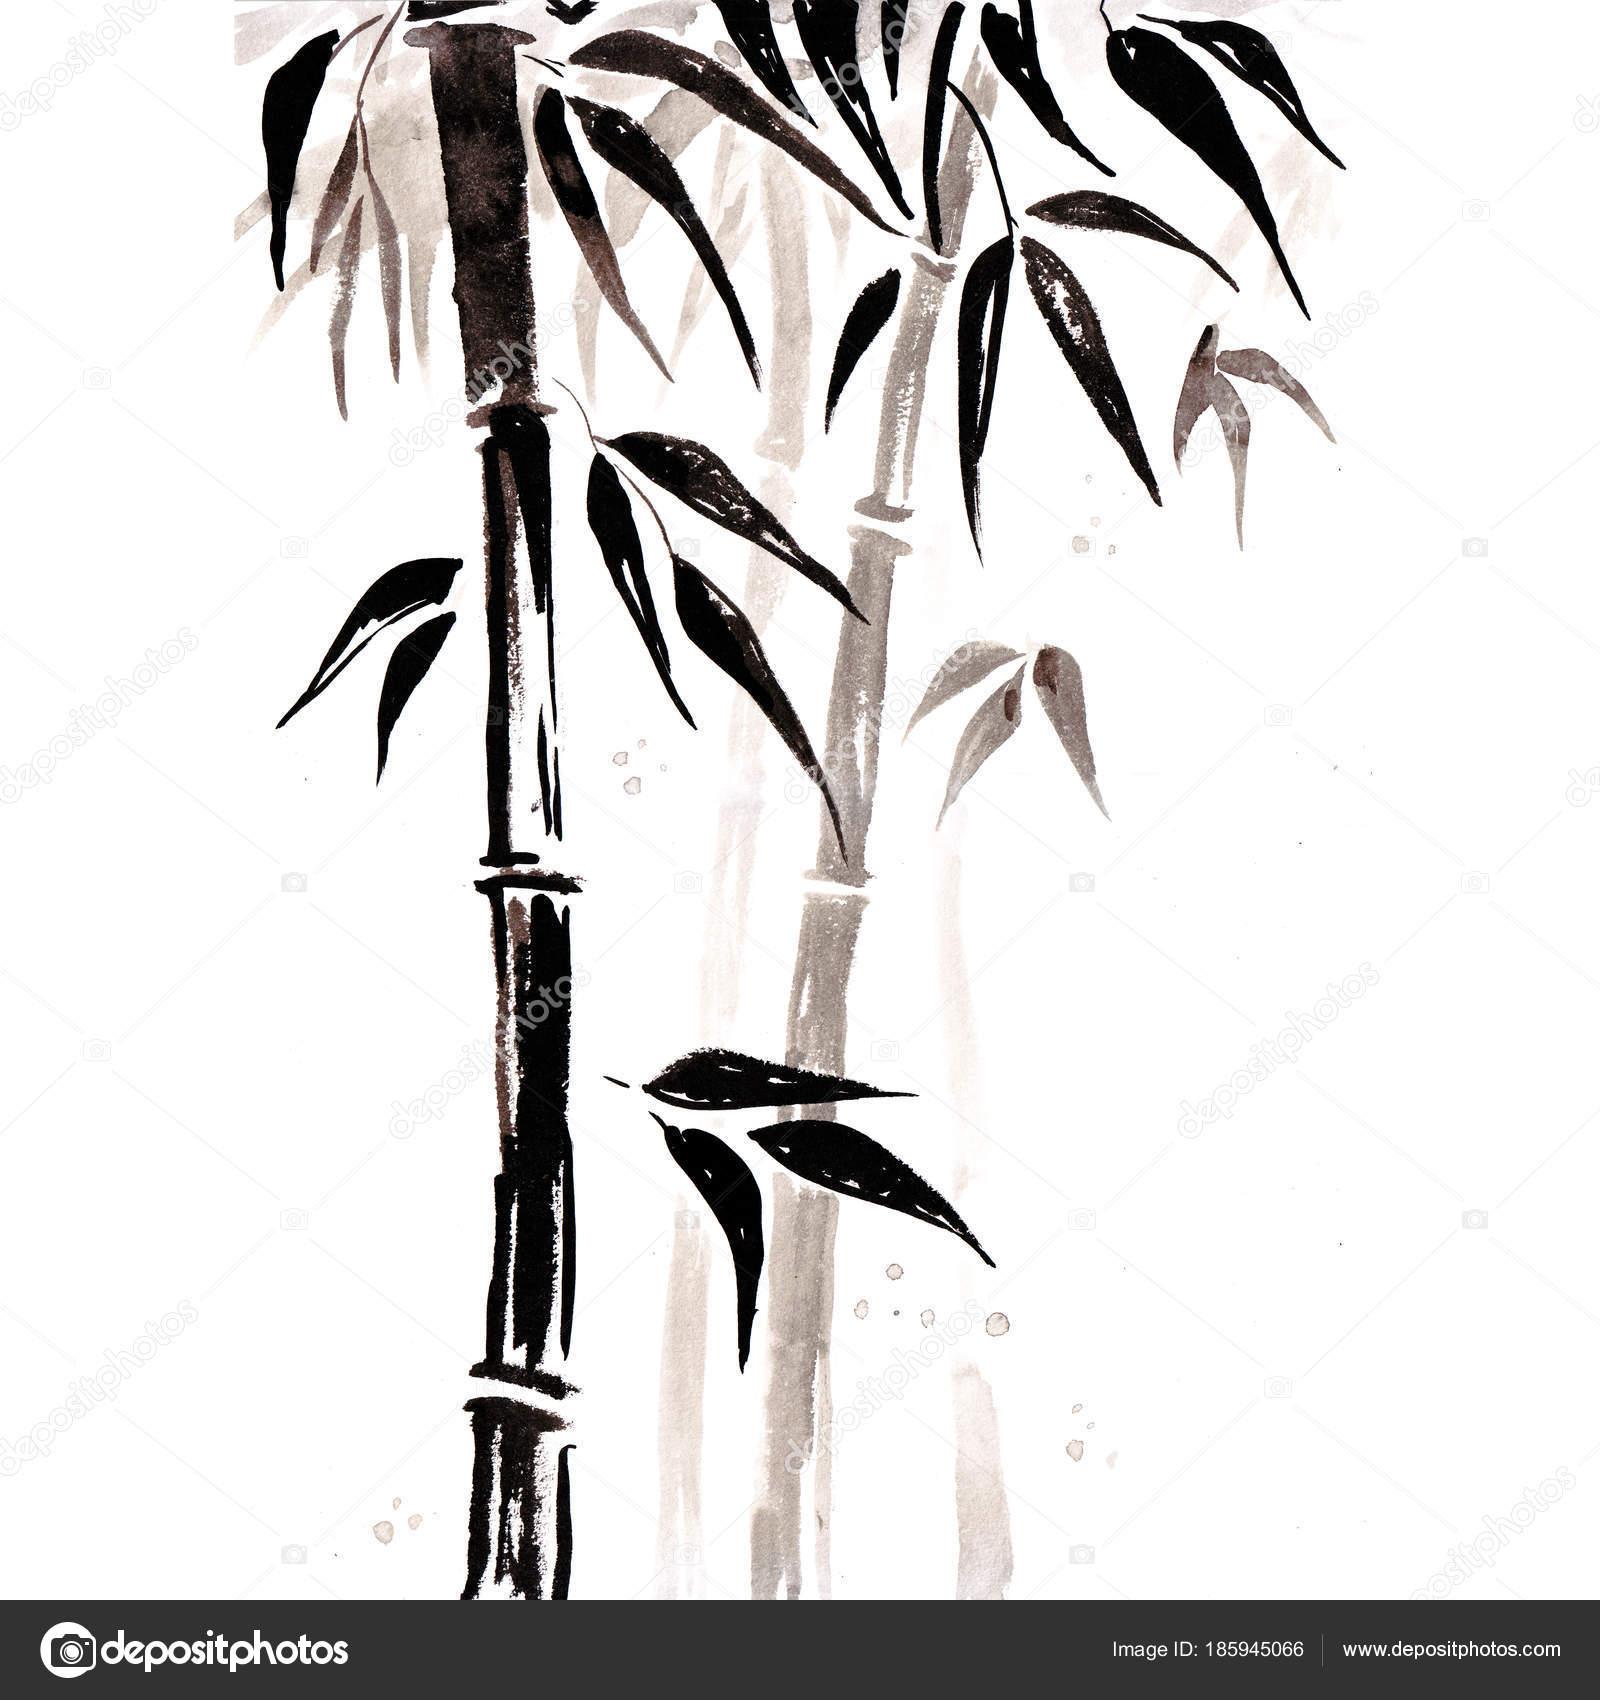 Hervorragend Bambus Im Japanischen Stil. Aquarell Hand Malerei Illustration U2014 Stockfoto